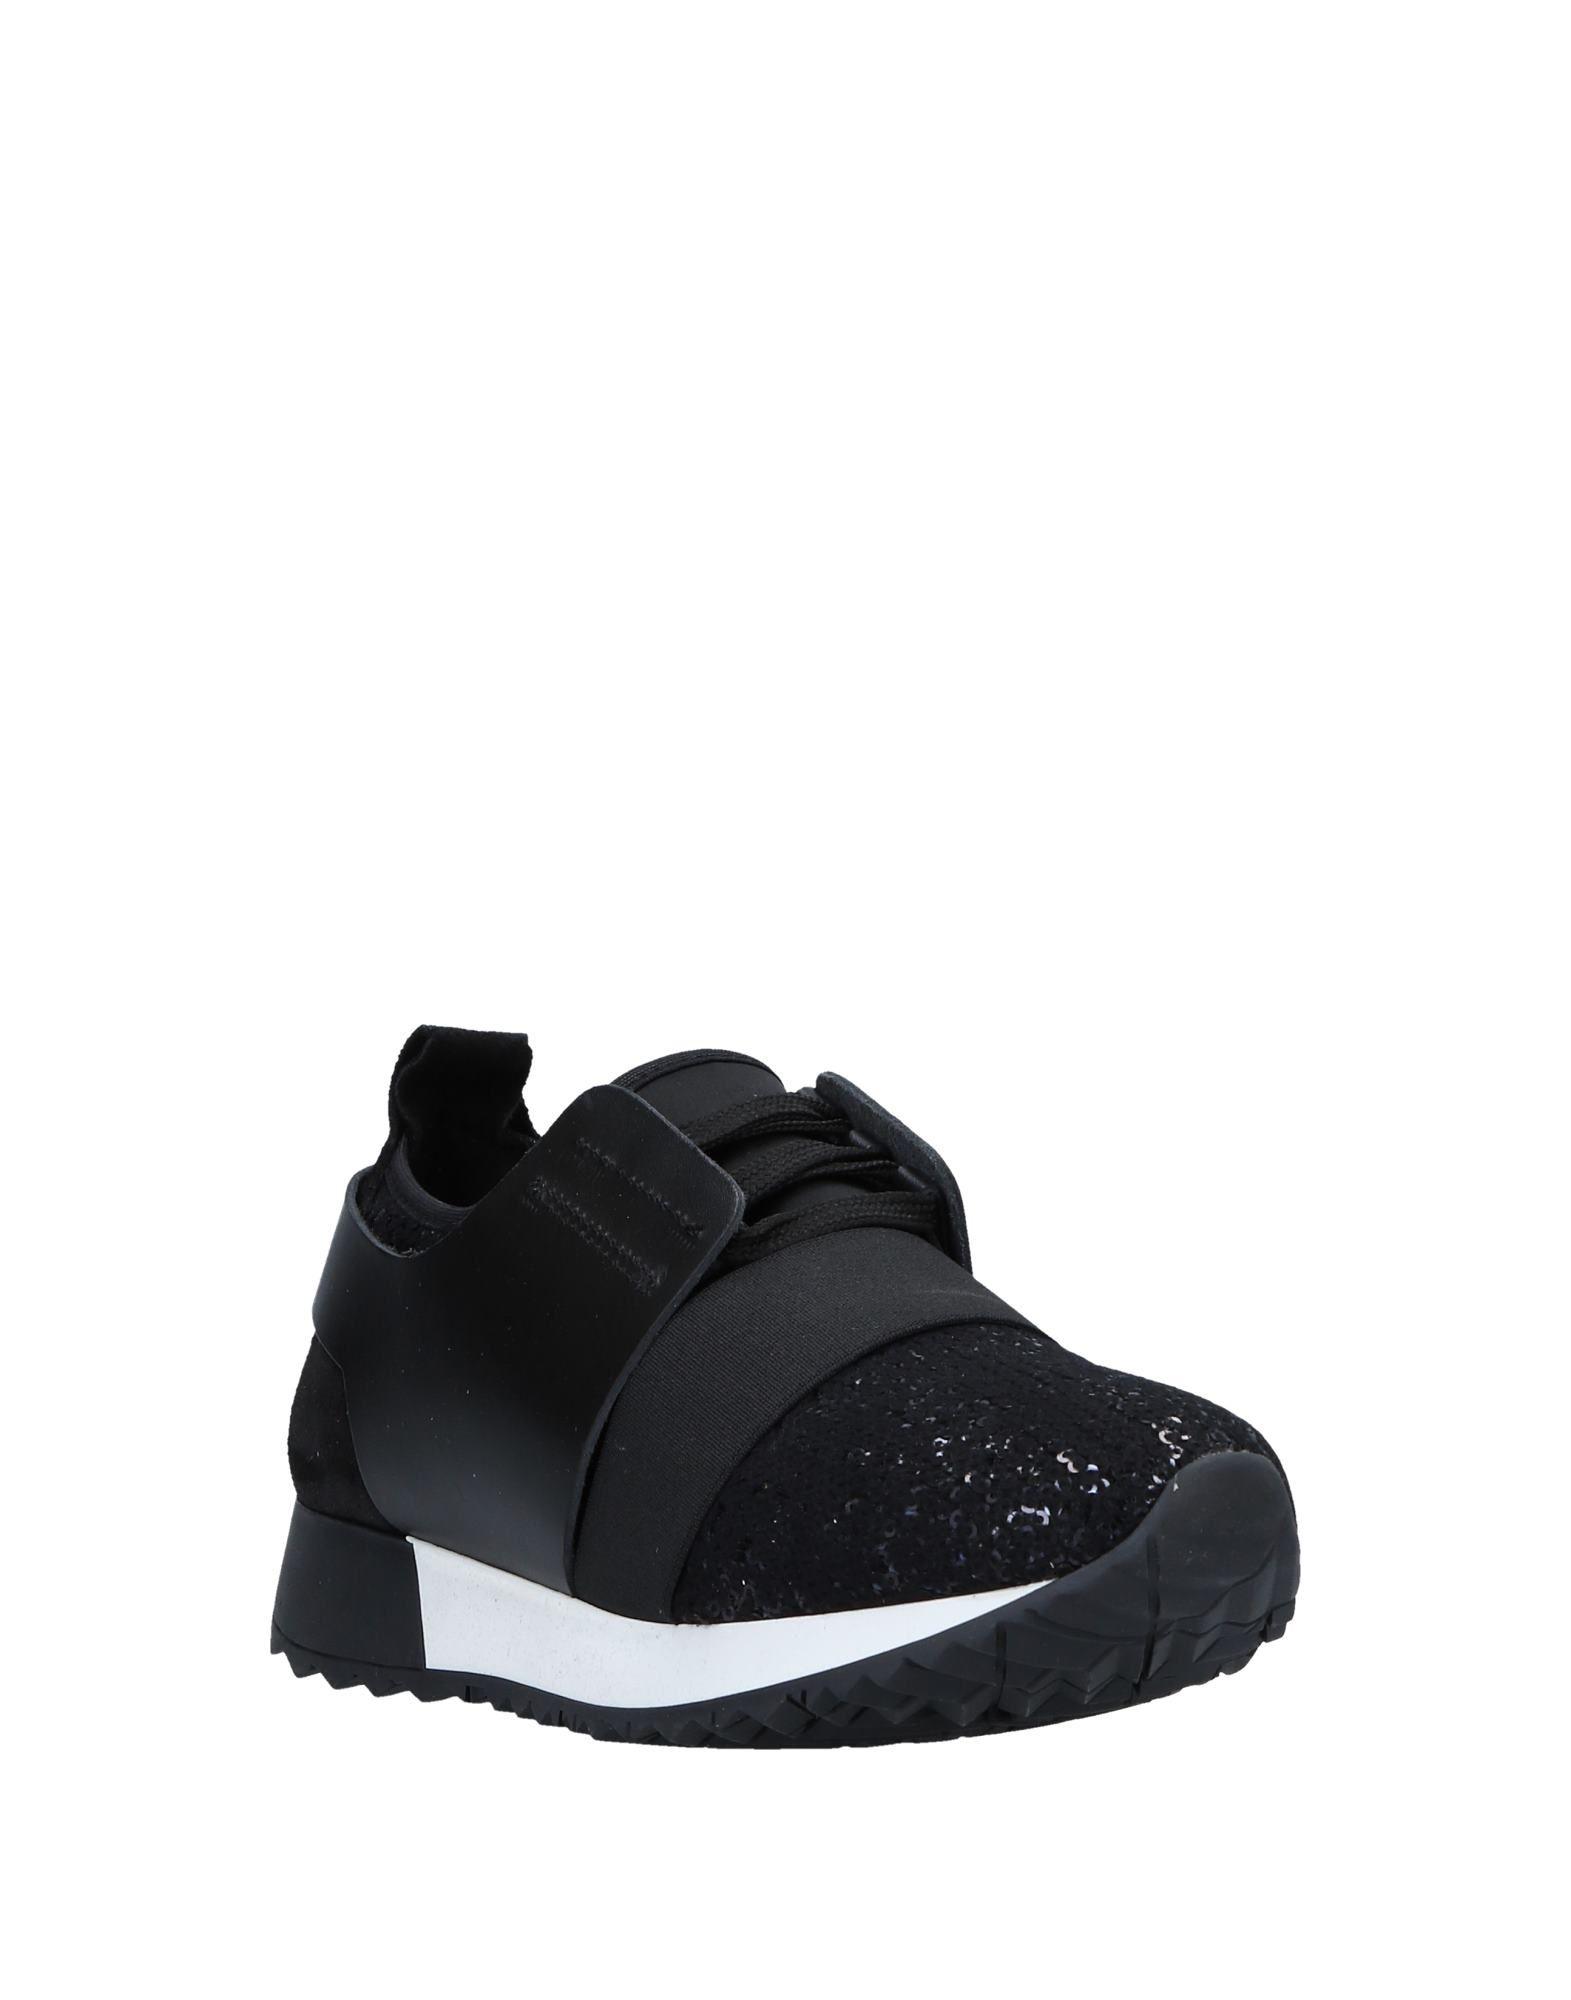 67 Sixtyseven Sneakers Sneakers - Women 67 Sixtyseven Sneakers Sneakers online on  Canada - 11542121GR 1af8c2